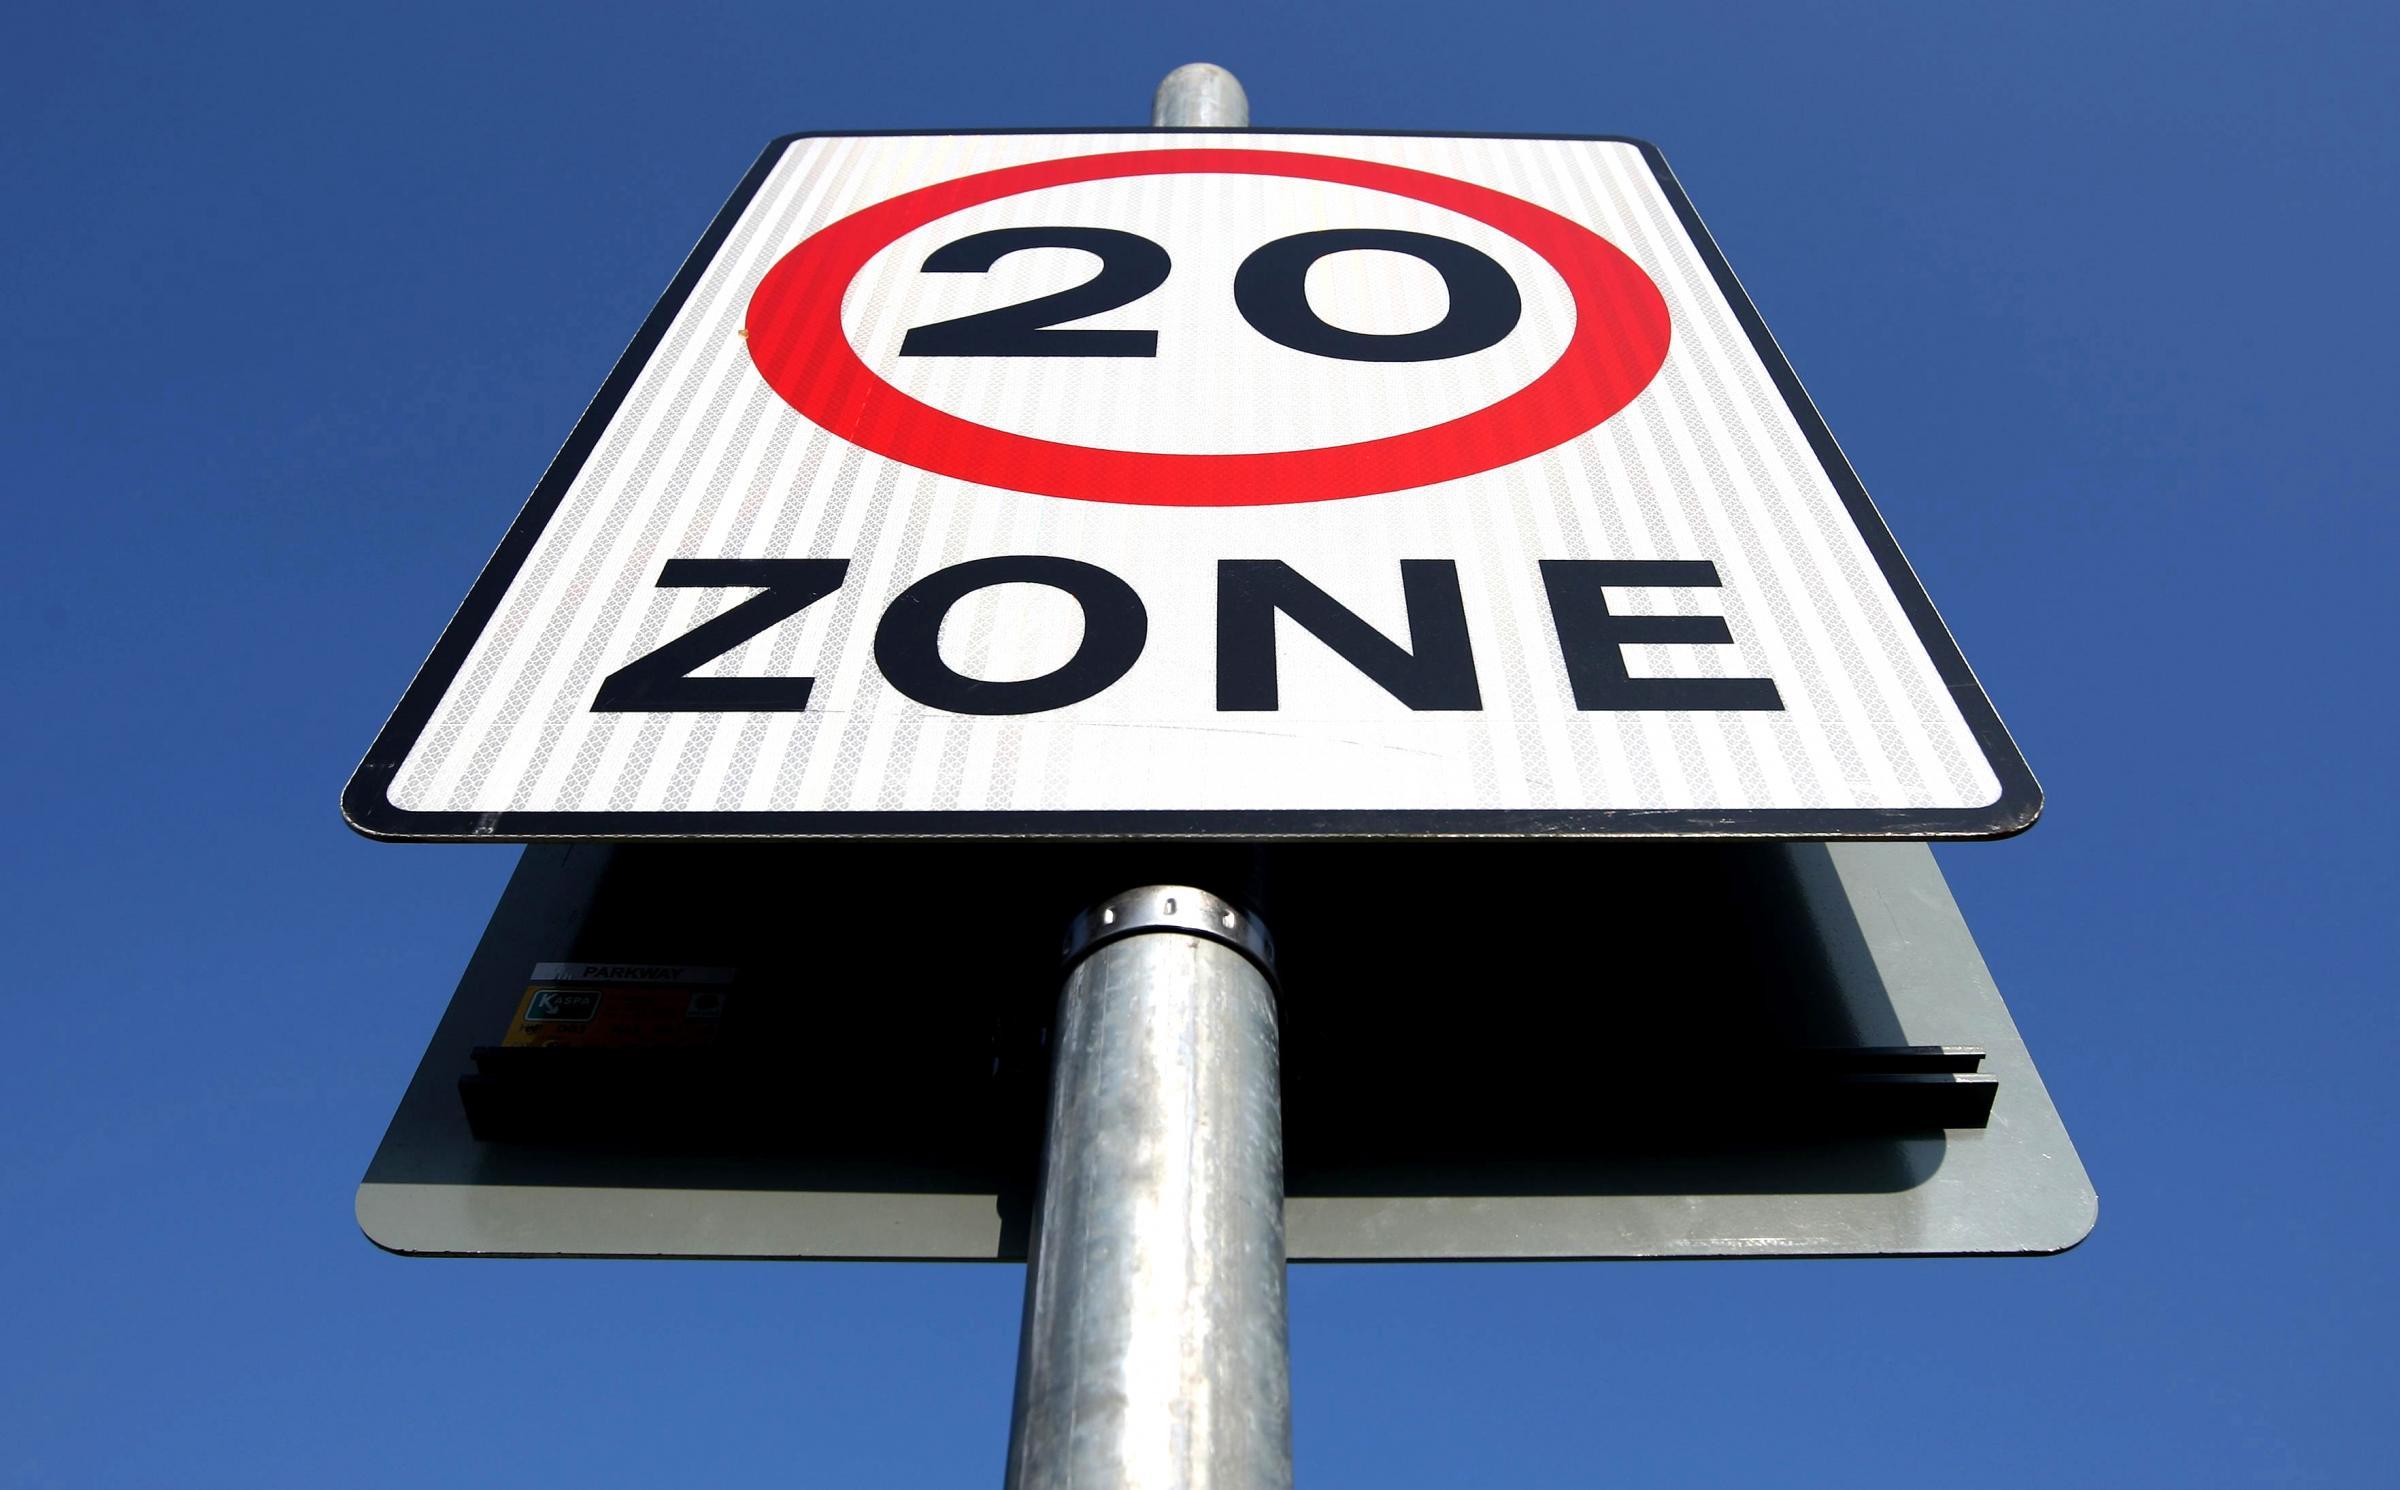 Glasgow roads set for 20mph limit as plans take step forward